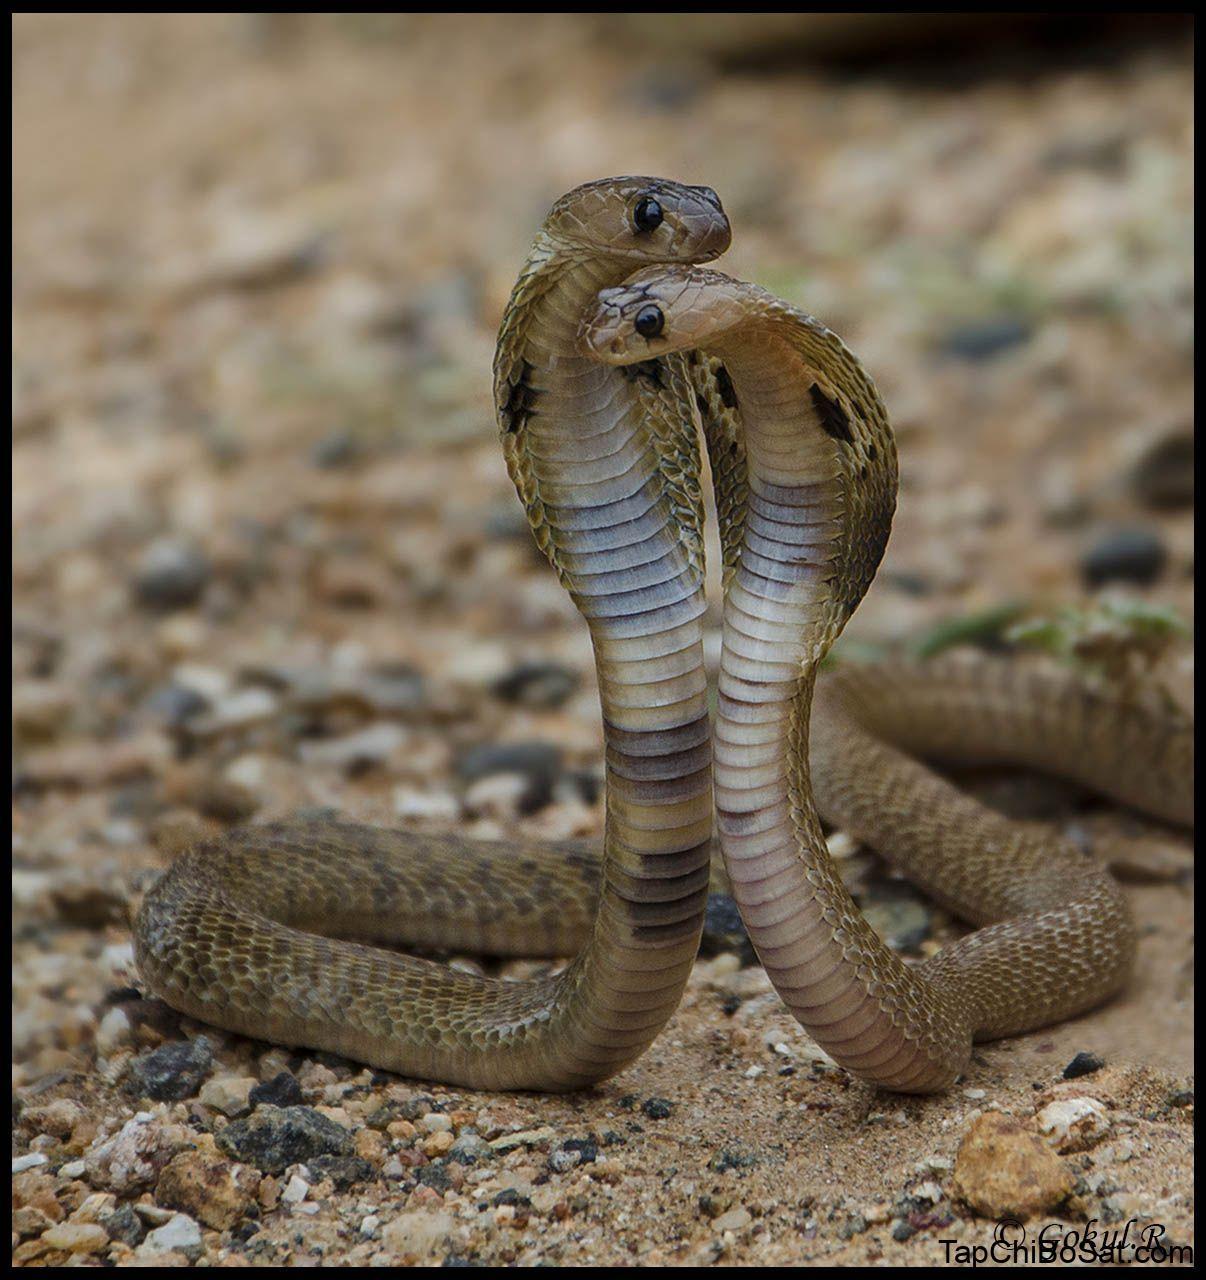 Indian cobra (Naja naja) | Snake, Reptiles, Animals